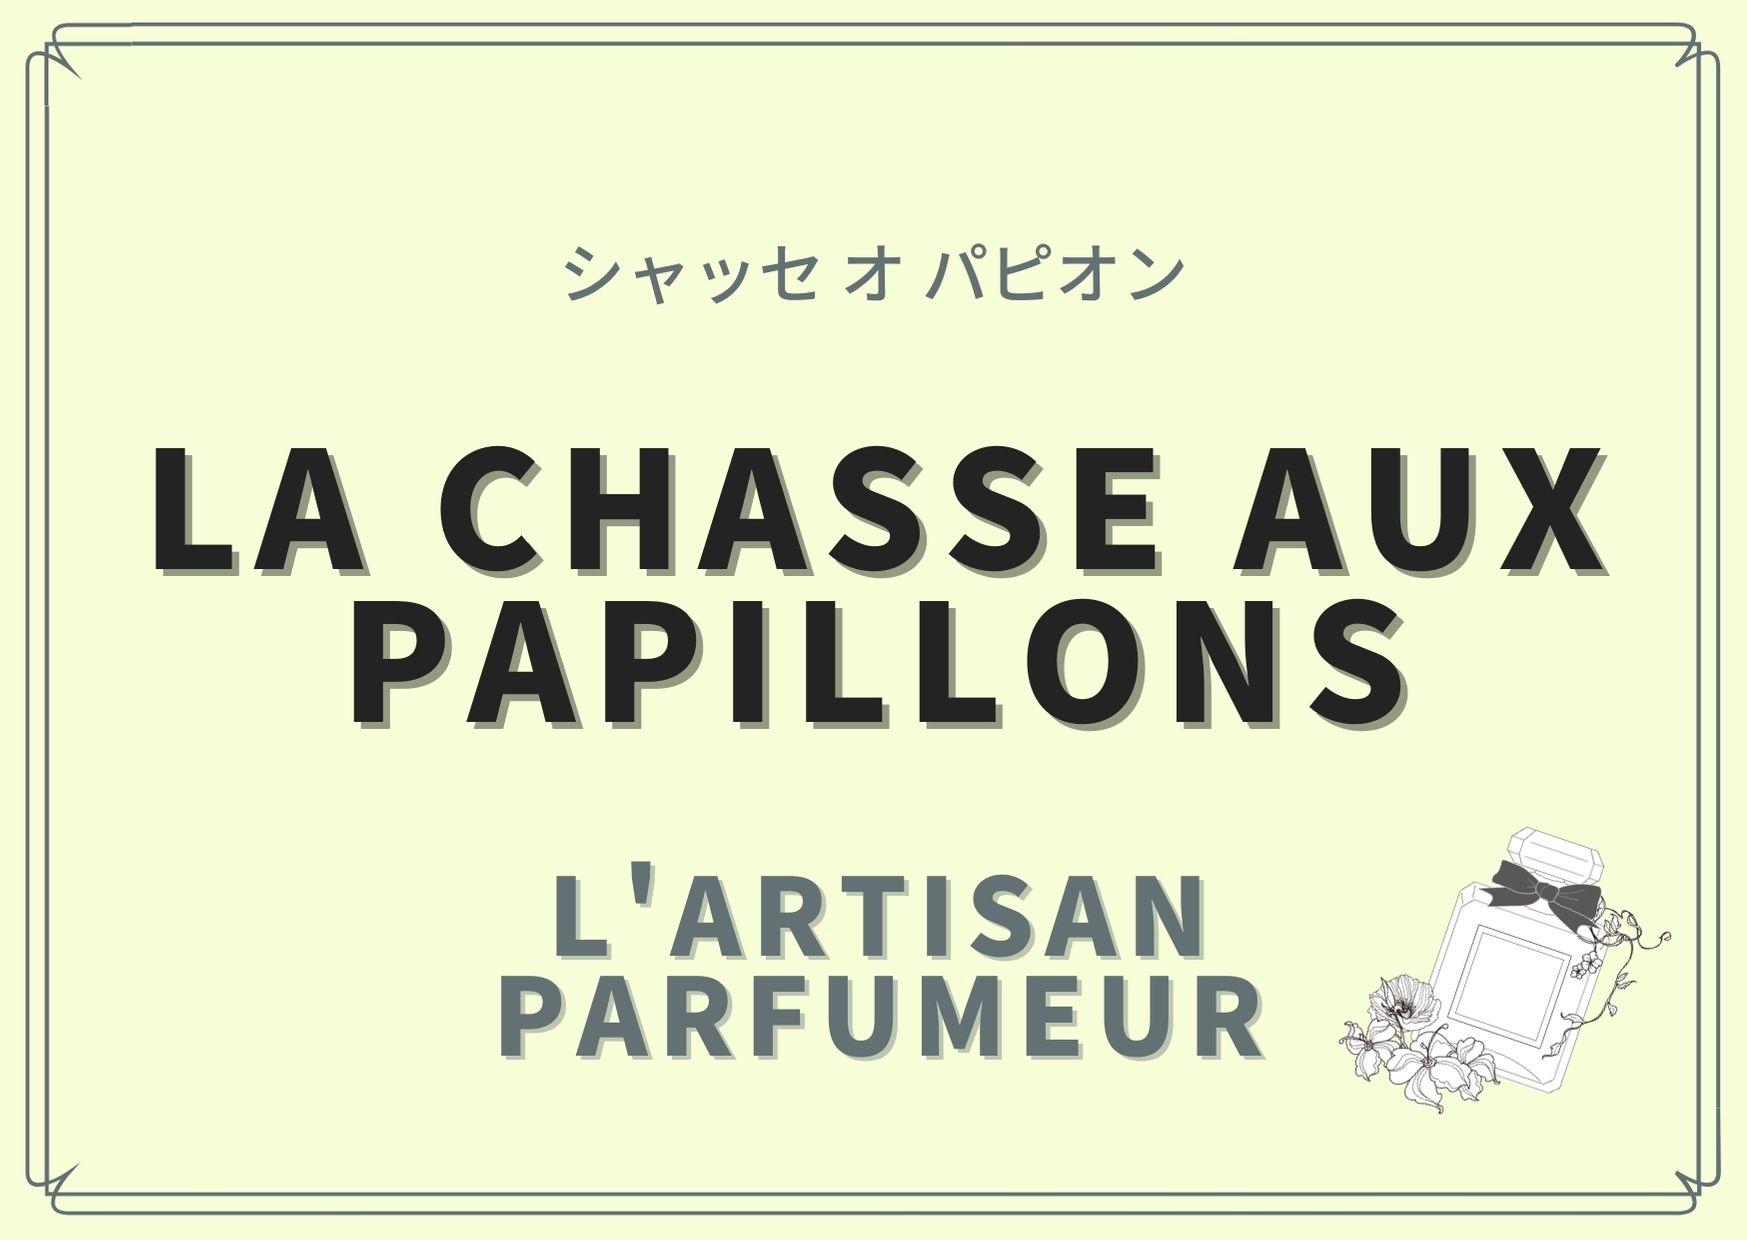 LA CHASSE AUX PAPILLONS(シャッセ オ パピオン)/L'ARTISAN PARFUMEUR(ラルチザン パフューム)